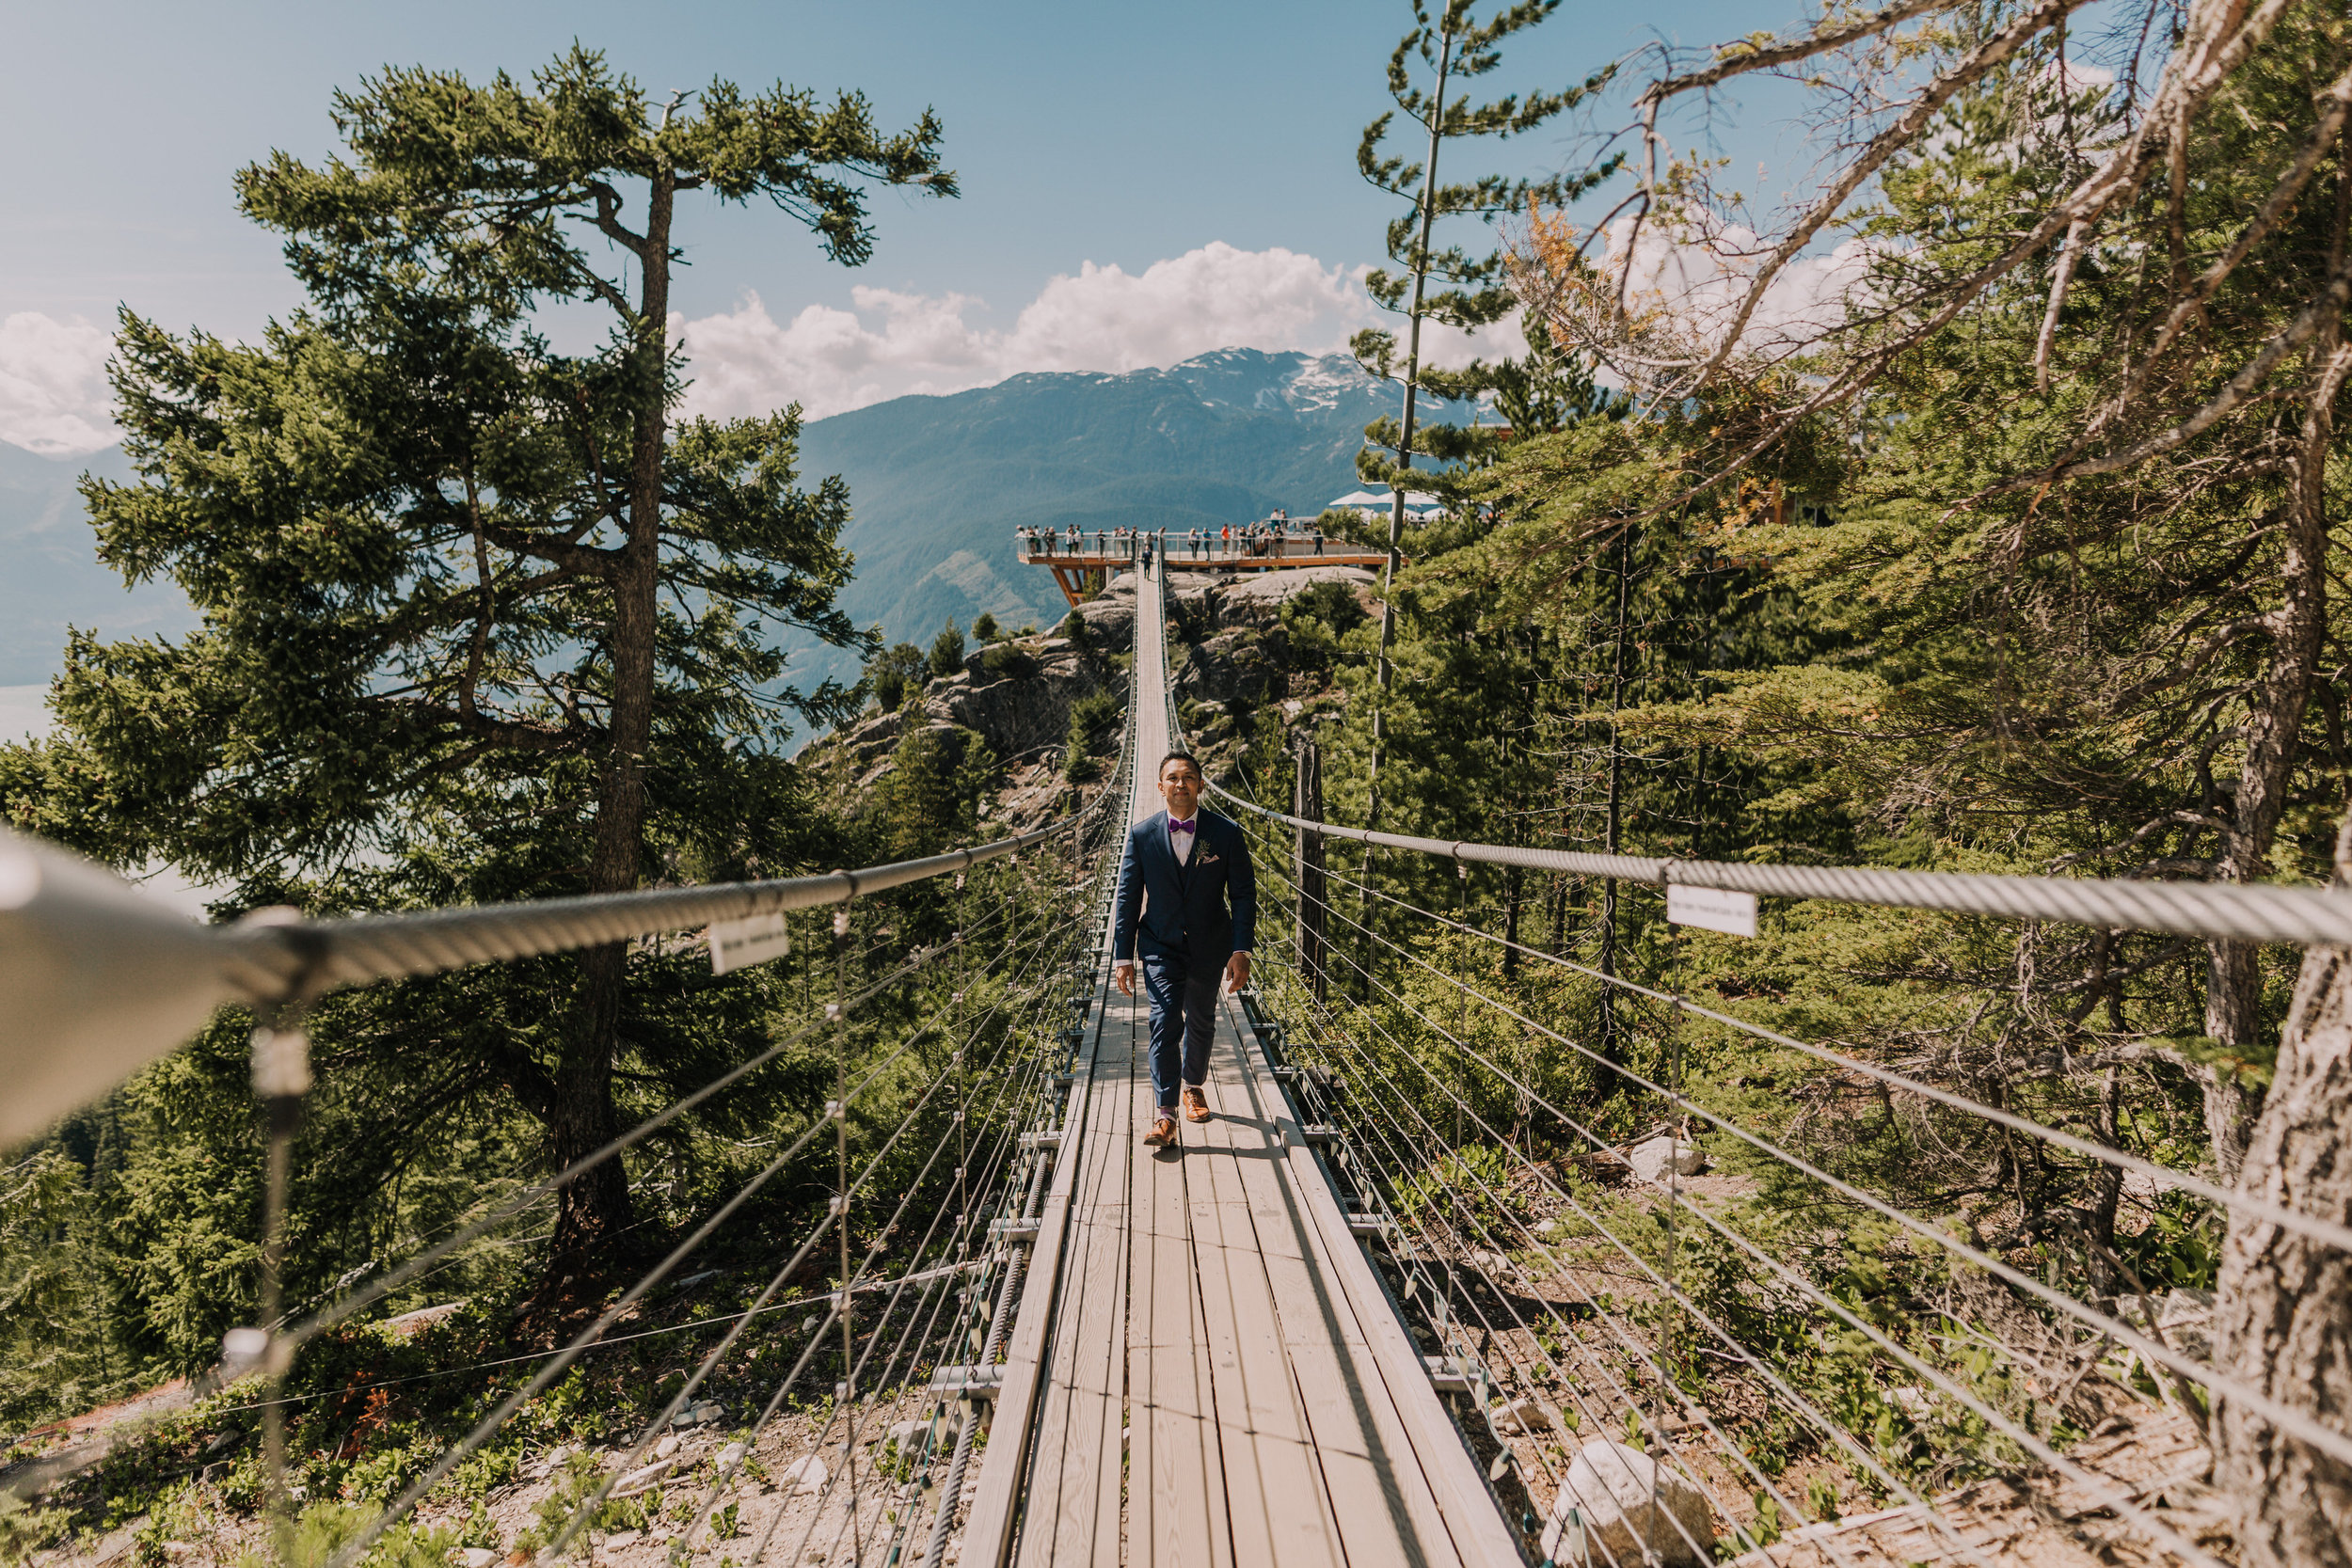 Squamish Wedding Photographer - Sea to Sky Gondola Wedding Photos -  Vancouver Wedding Photographer & Videographer - Sunshine Coast Wedding Photos - Sunshine Coast Wedding Photographer - Jennifer Picard Photography - IMG_2843.jpg